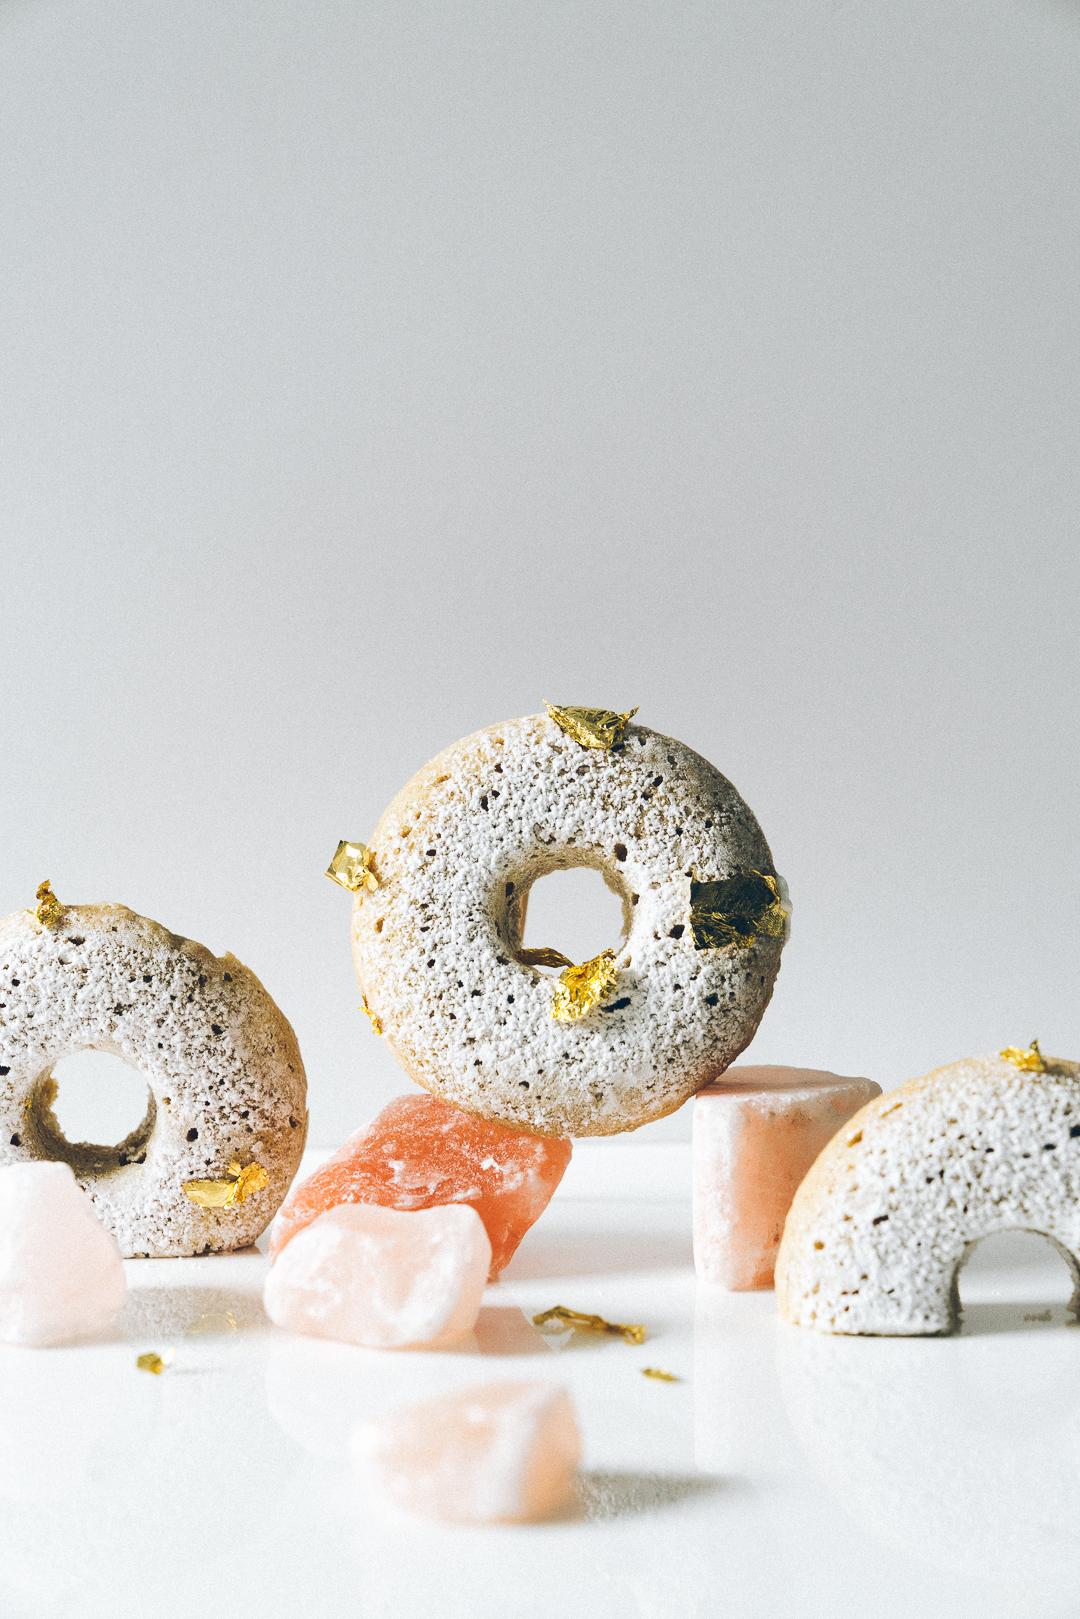 Earl Grey Quinoa Doughnuts